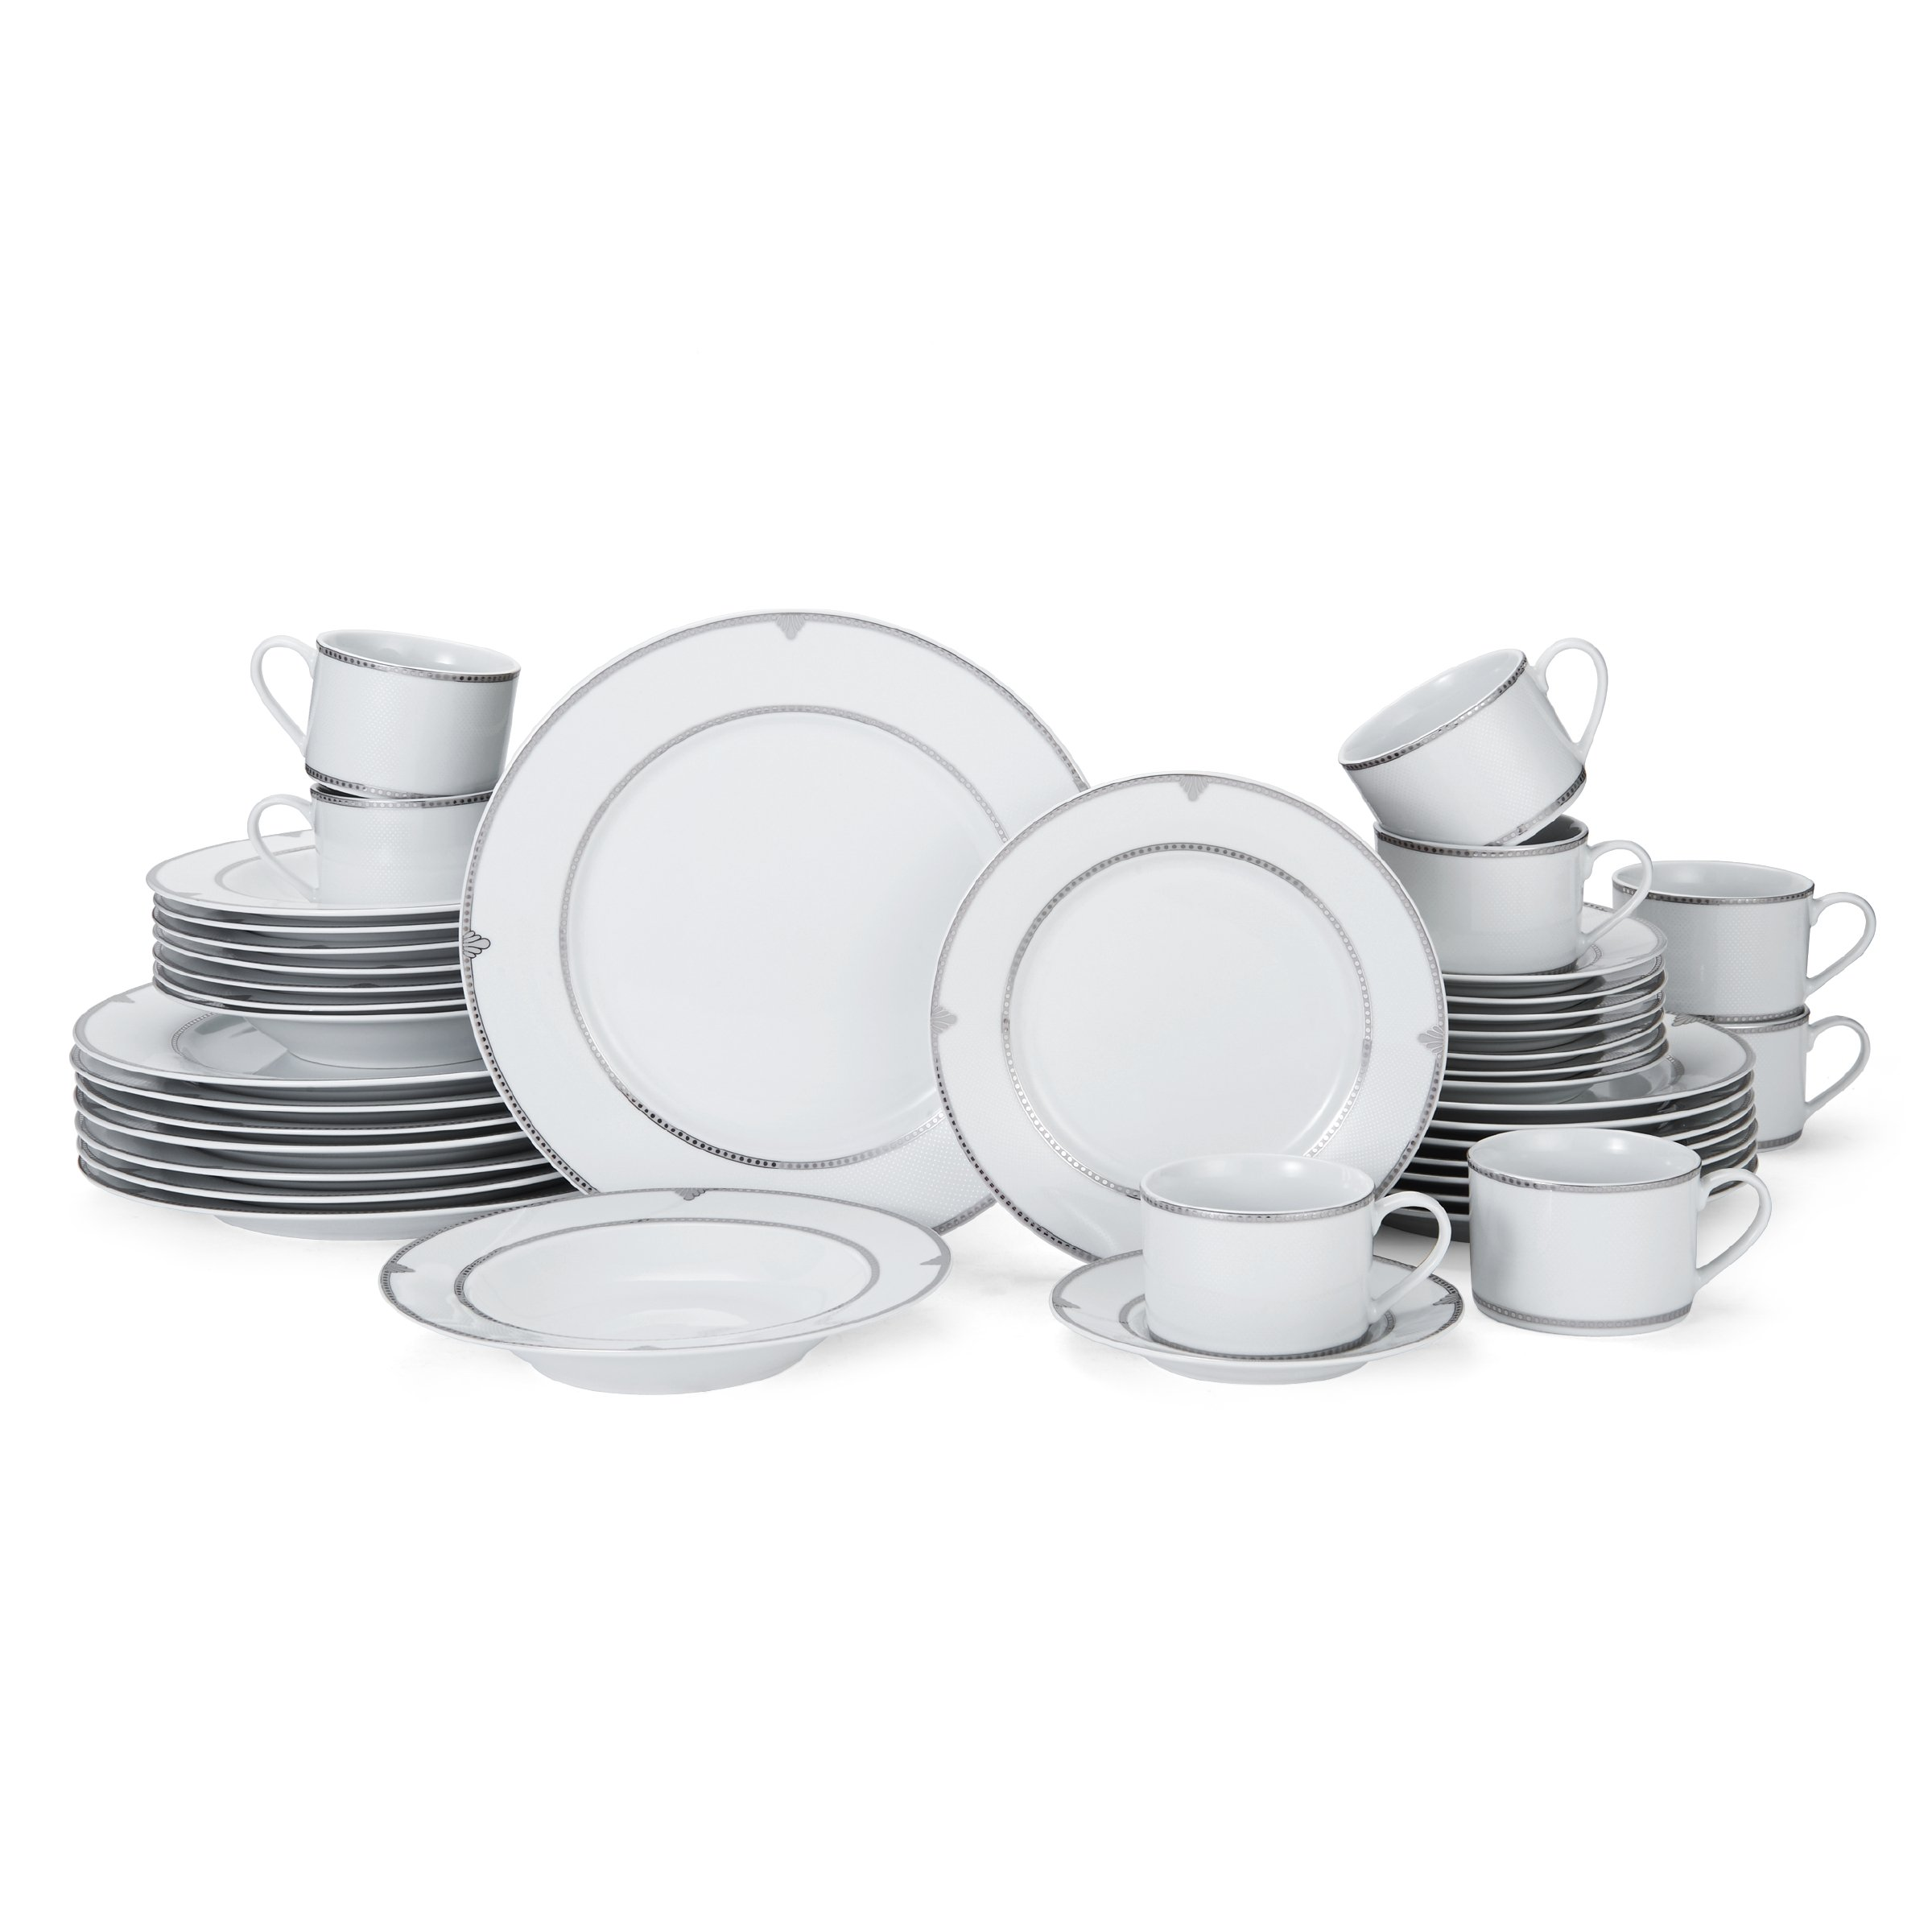 Mikasa Regent Bead 40-Piece Porcelain Dinnerware Set, Service for 8 by Mikasa (Image #3)